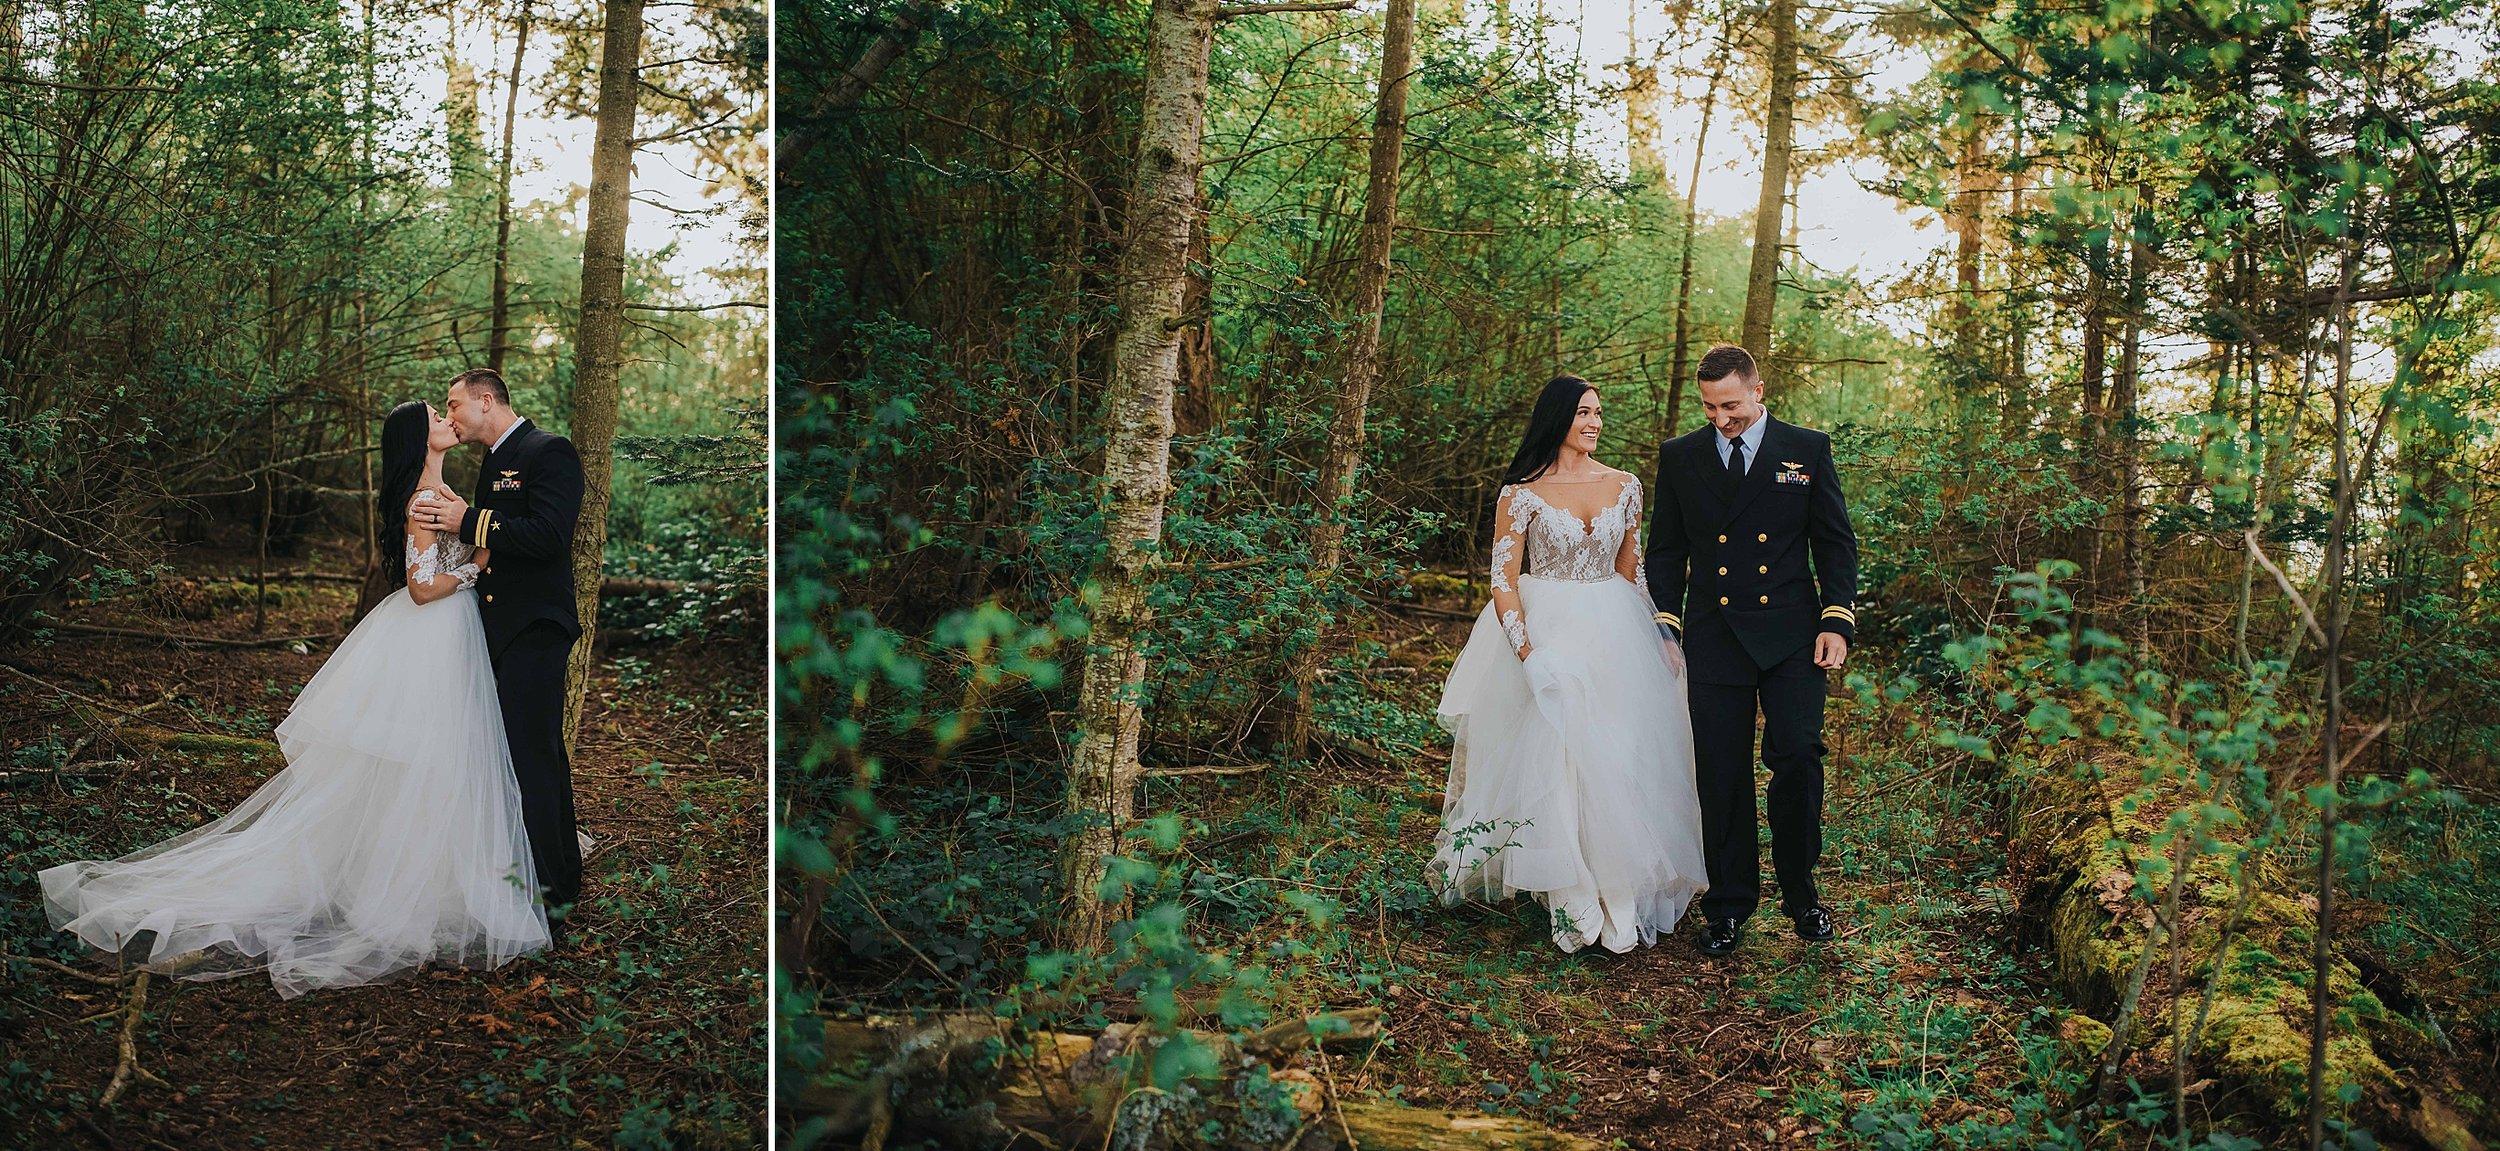 KC-Wedding-photographer-J HODGES PHOTOGRAPHY_0258.jpg